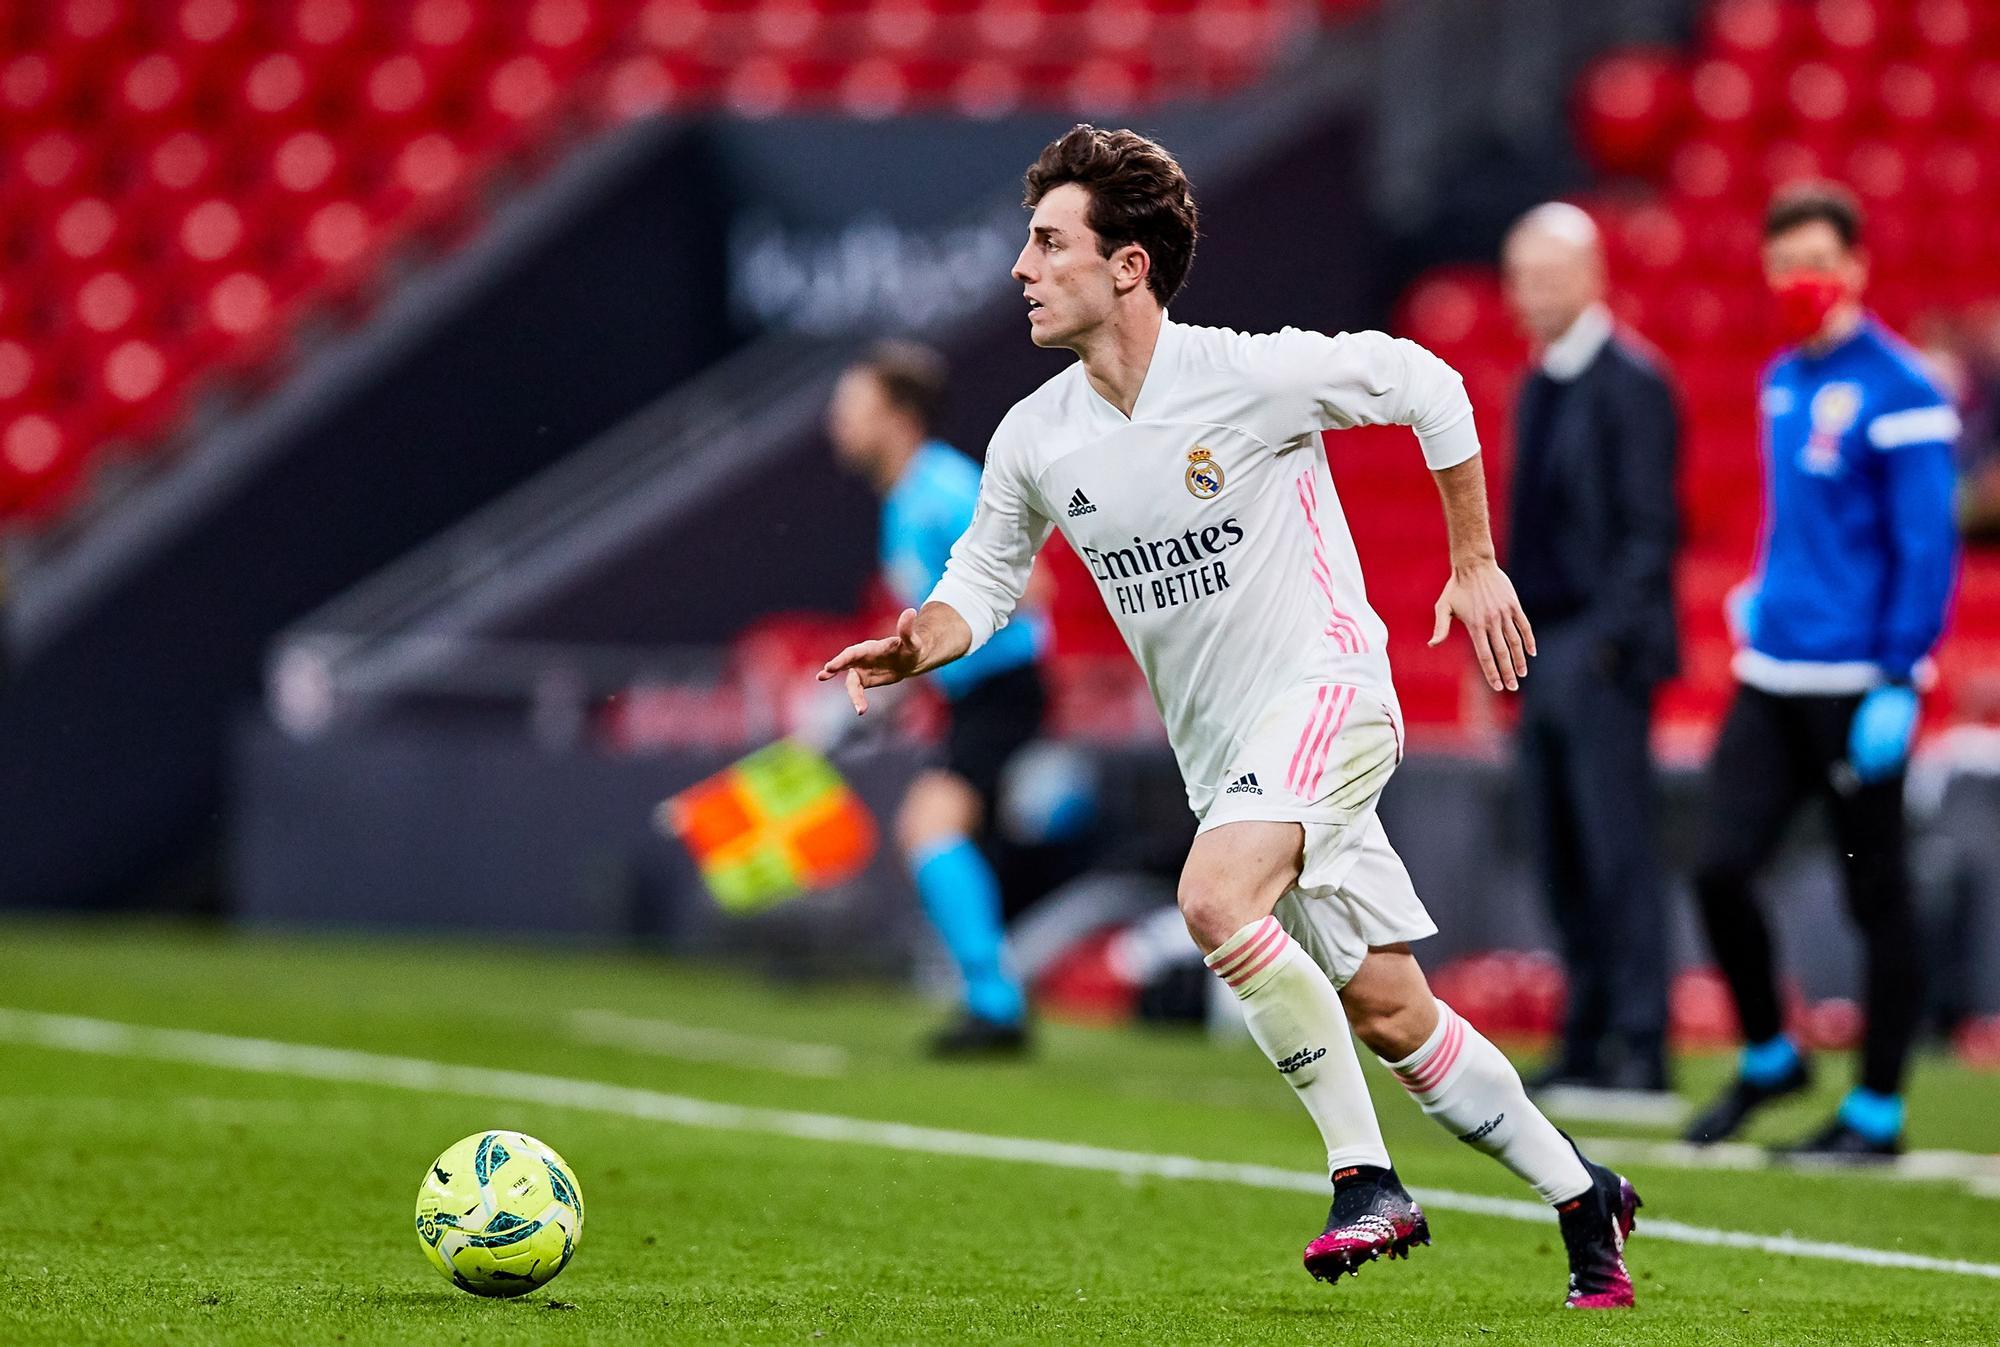 LaLiga Santander: Athletic - Real Madrid